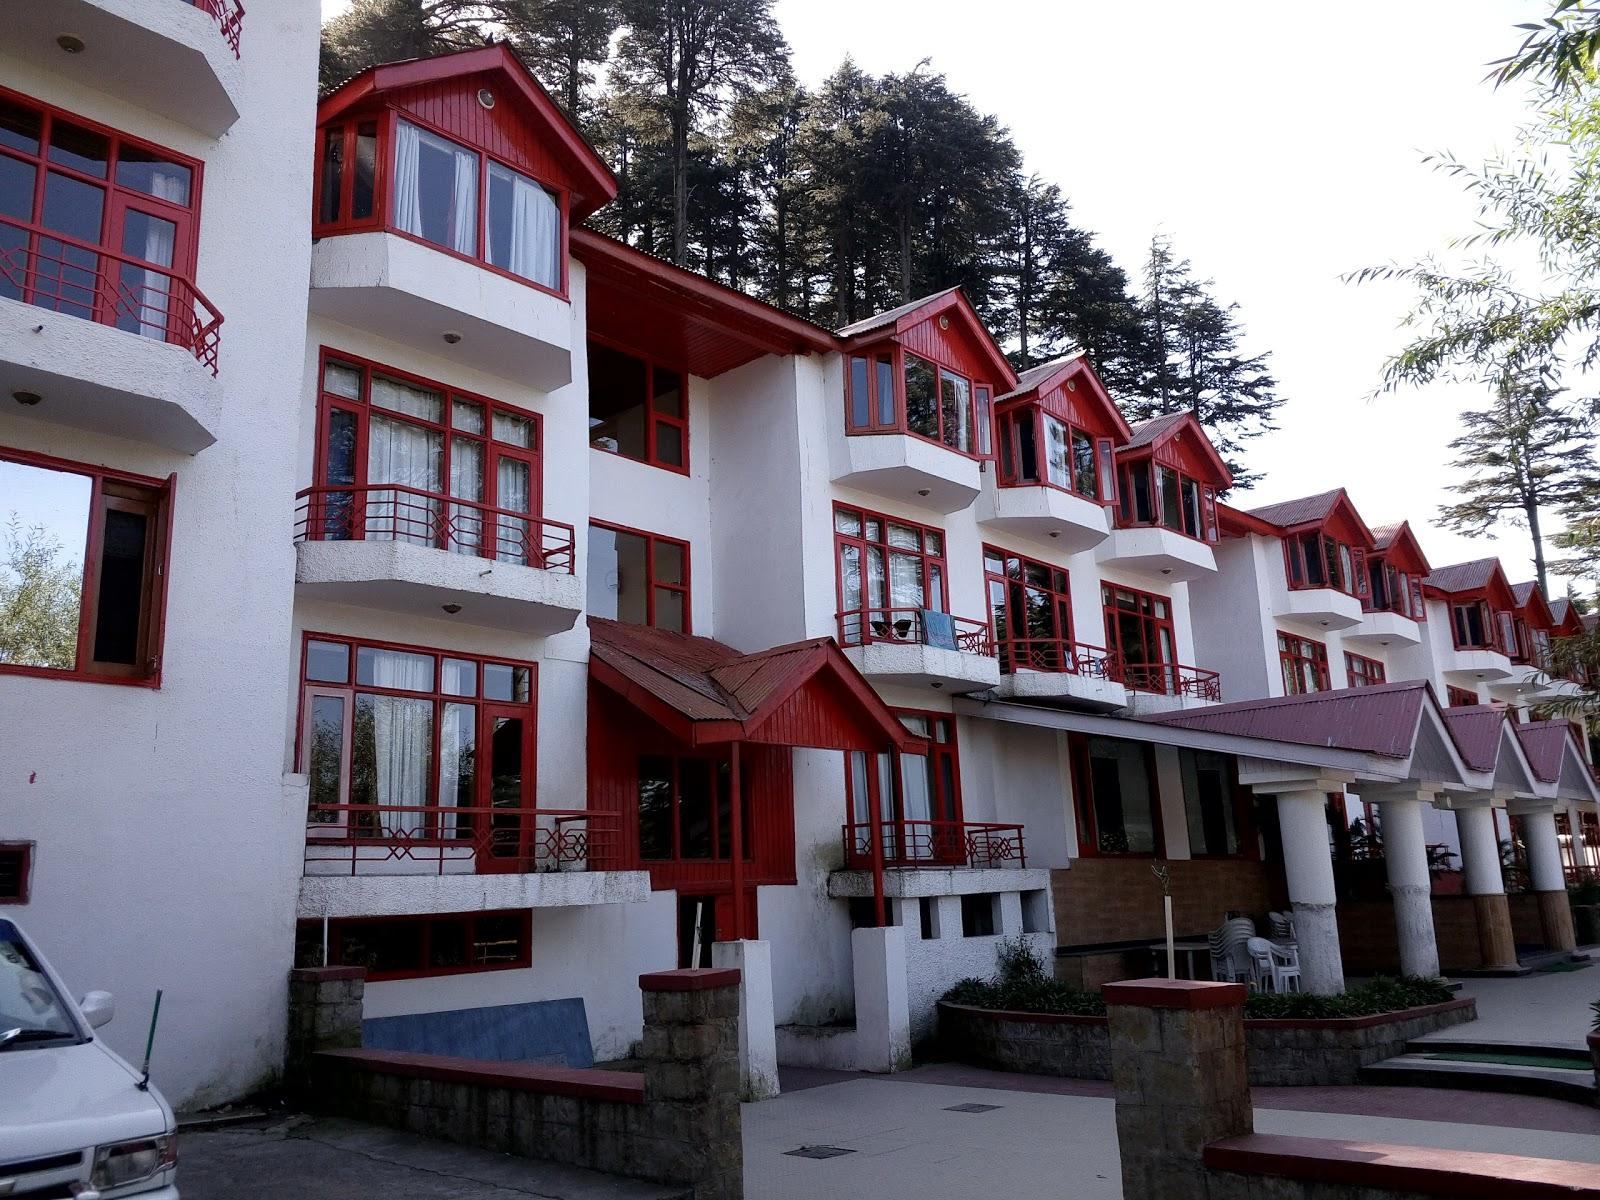 Hotel Jai Skahan Maple Dak Bangalow Around Guides